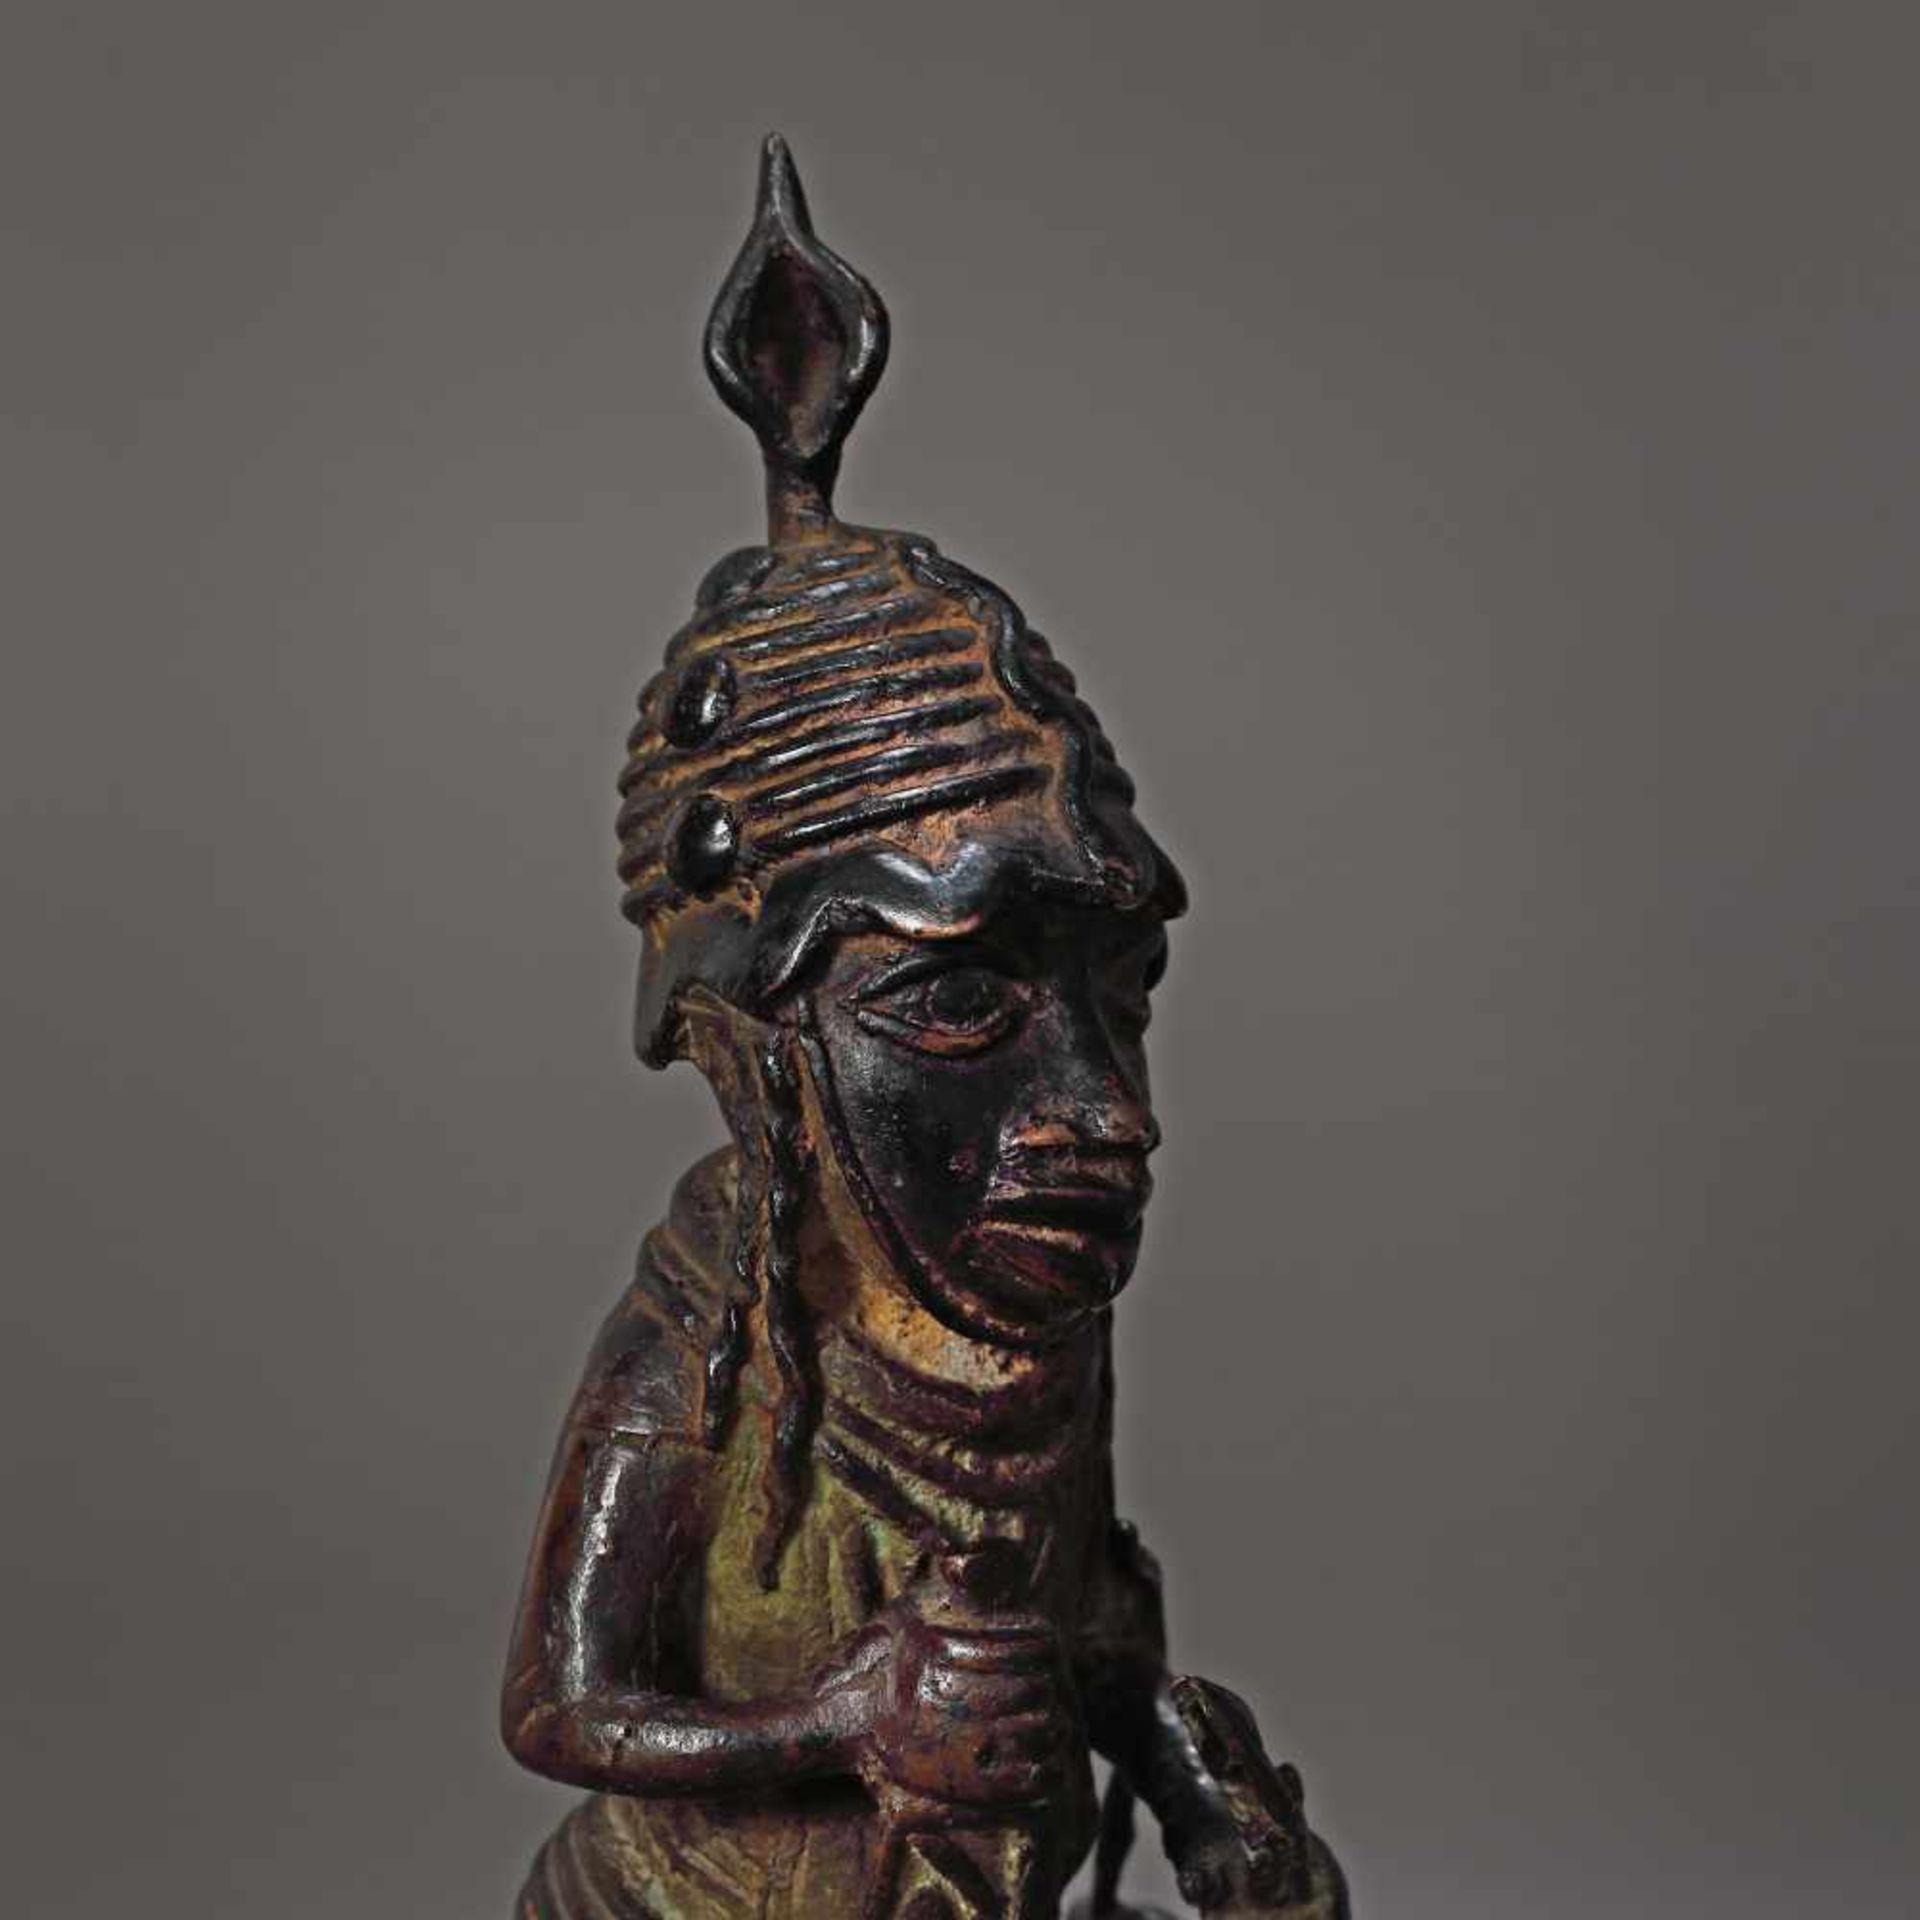 Bronze statuette, representing a warrior, possibly Nigeria, early 20th century - Bild 4 aus 4